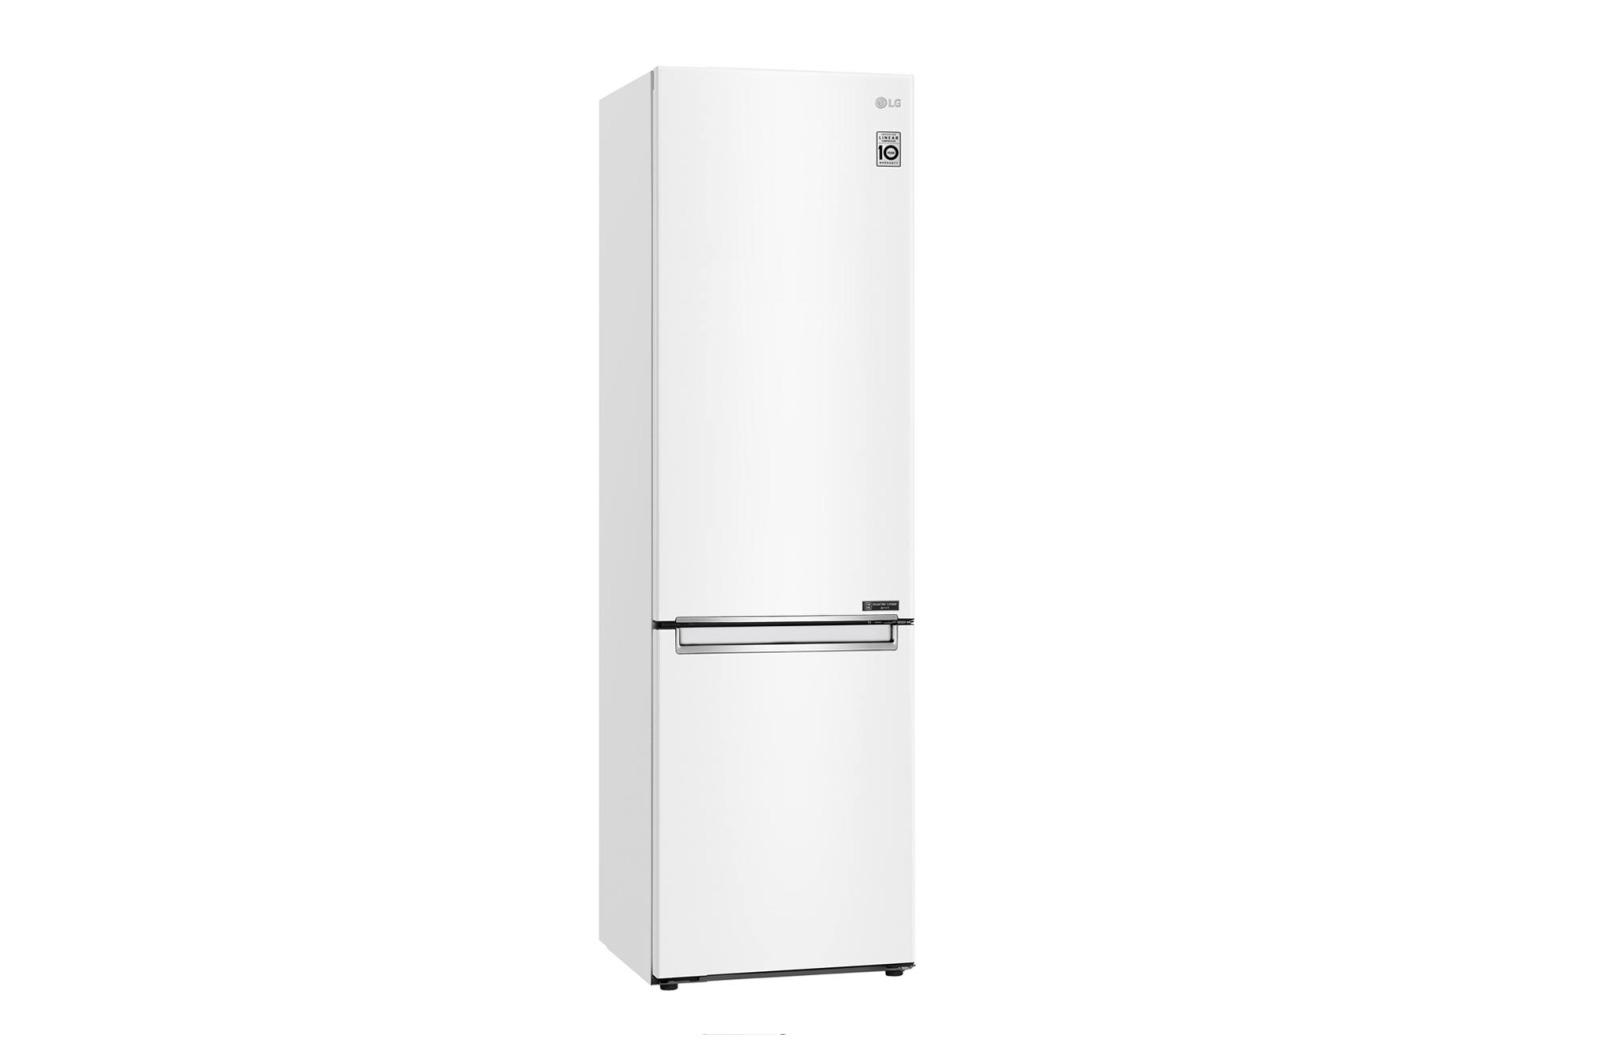 LG koelkast met vriesvak GBP62SWNFN wit - Prijsvergelijk